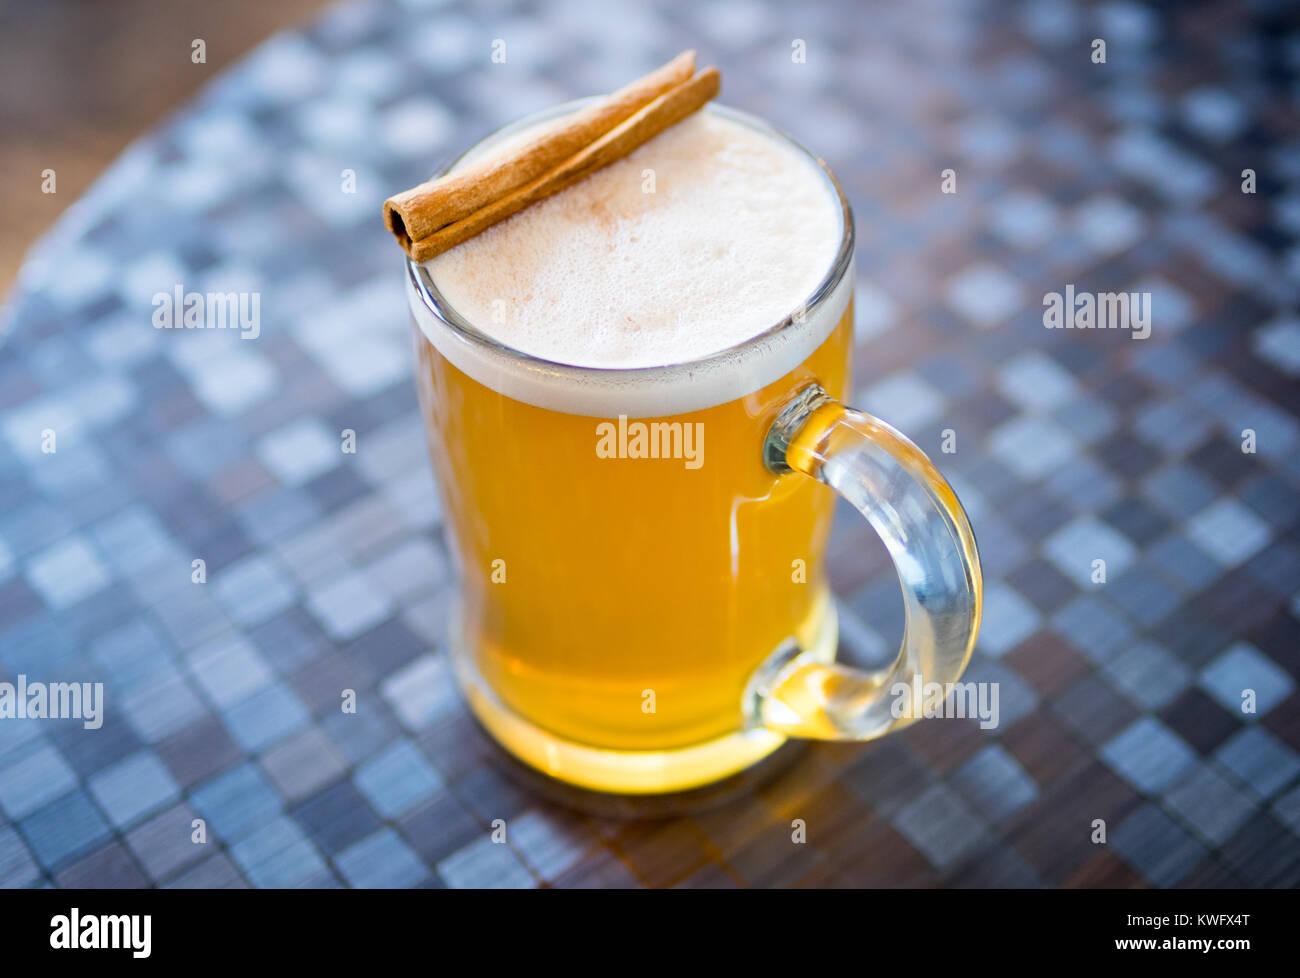 A mug of hot apple cider with cinnamon stick at D'Lish by Tish Cafe in Saskatoon, Saskatchewan, Canada. - Stock Image